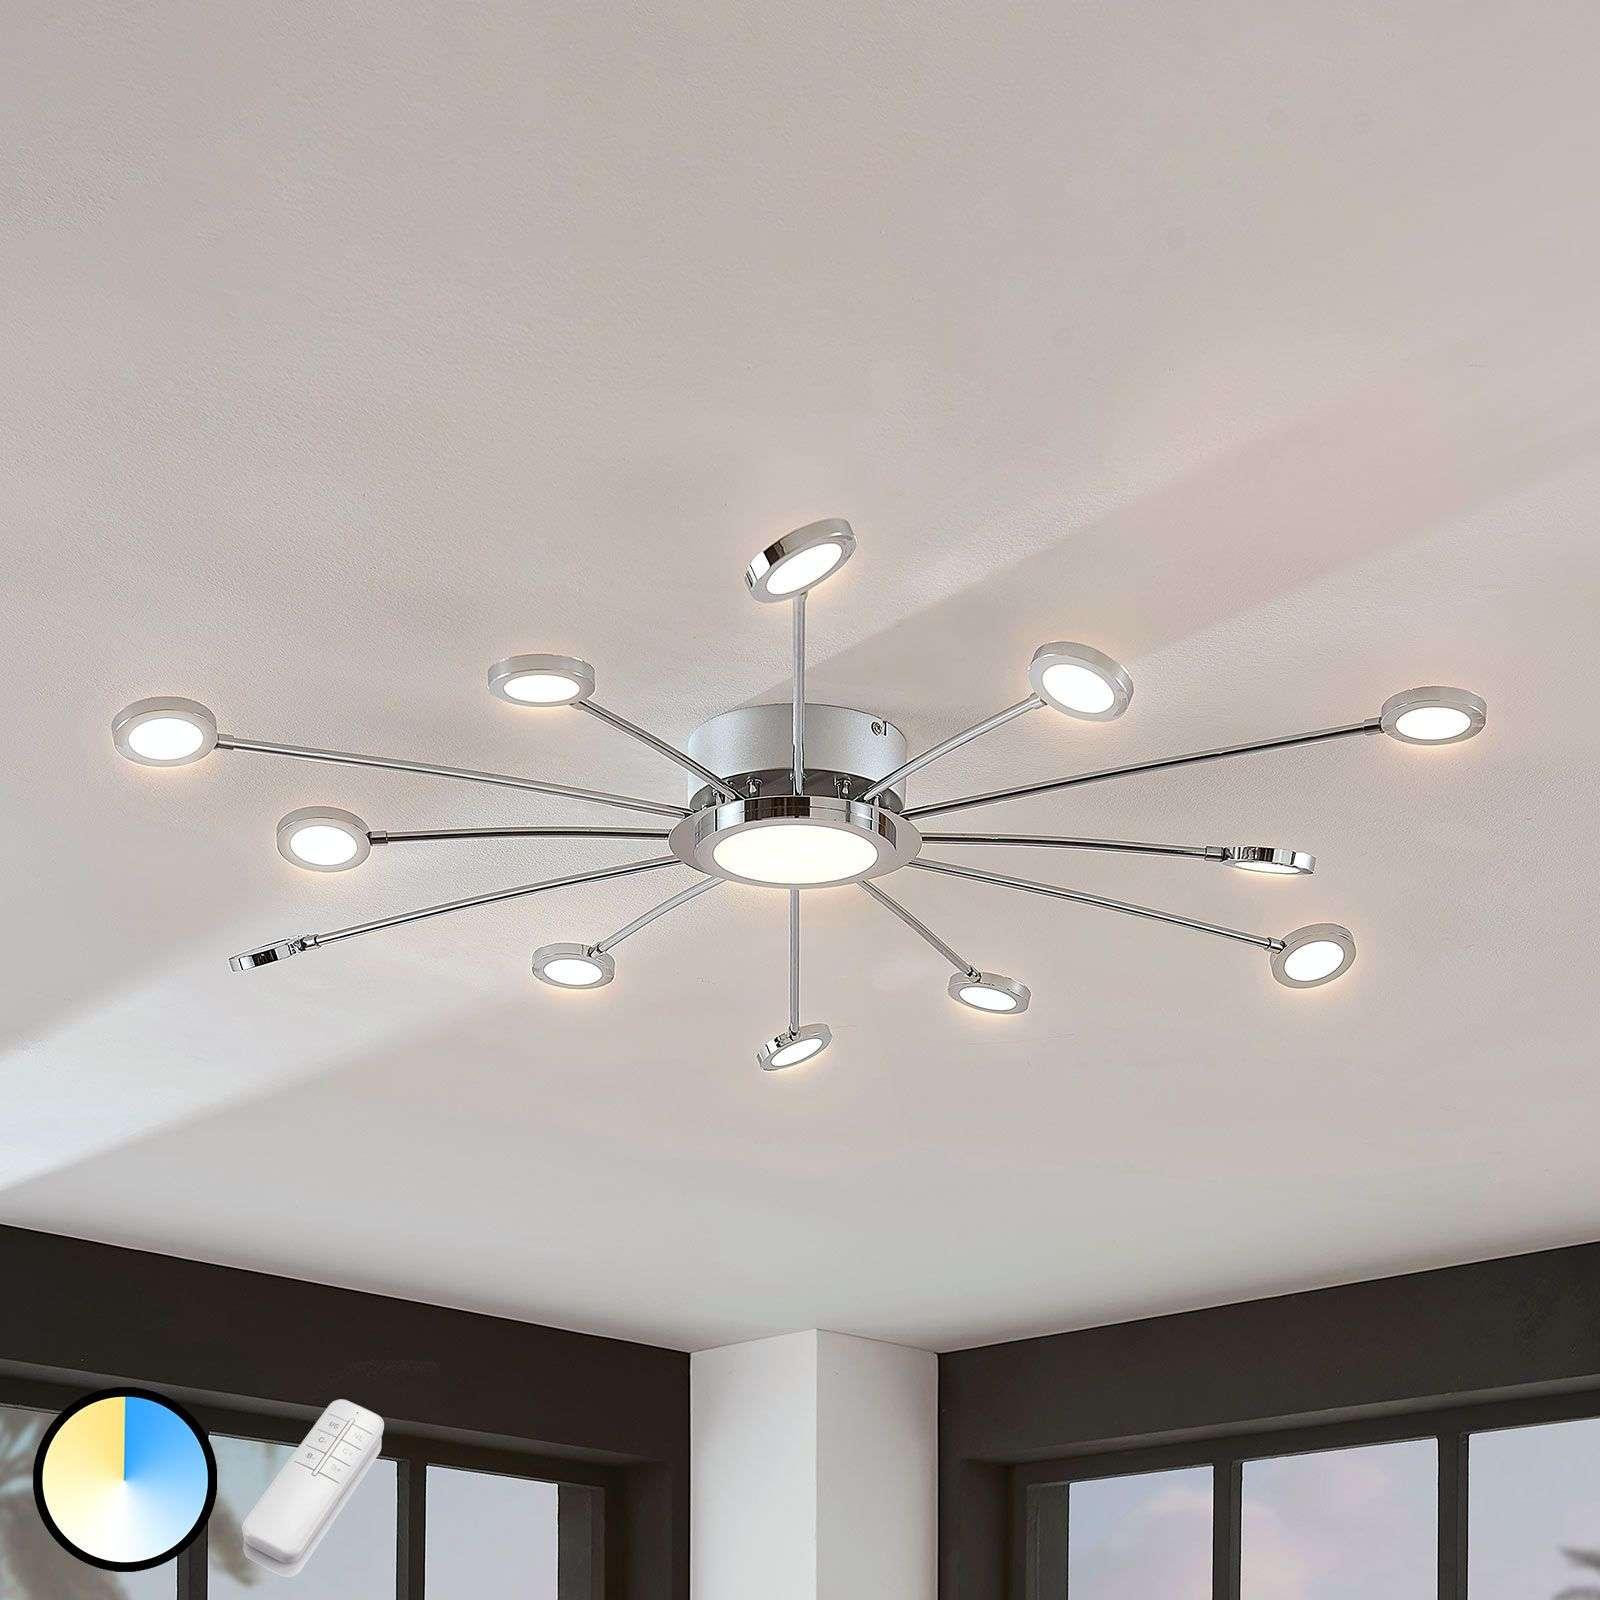 Large bright led ceiling lamp meru remote control lights large bright led ceiling lamp meru remote control 8032115 36 aloadofball Images